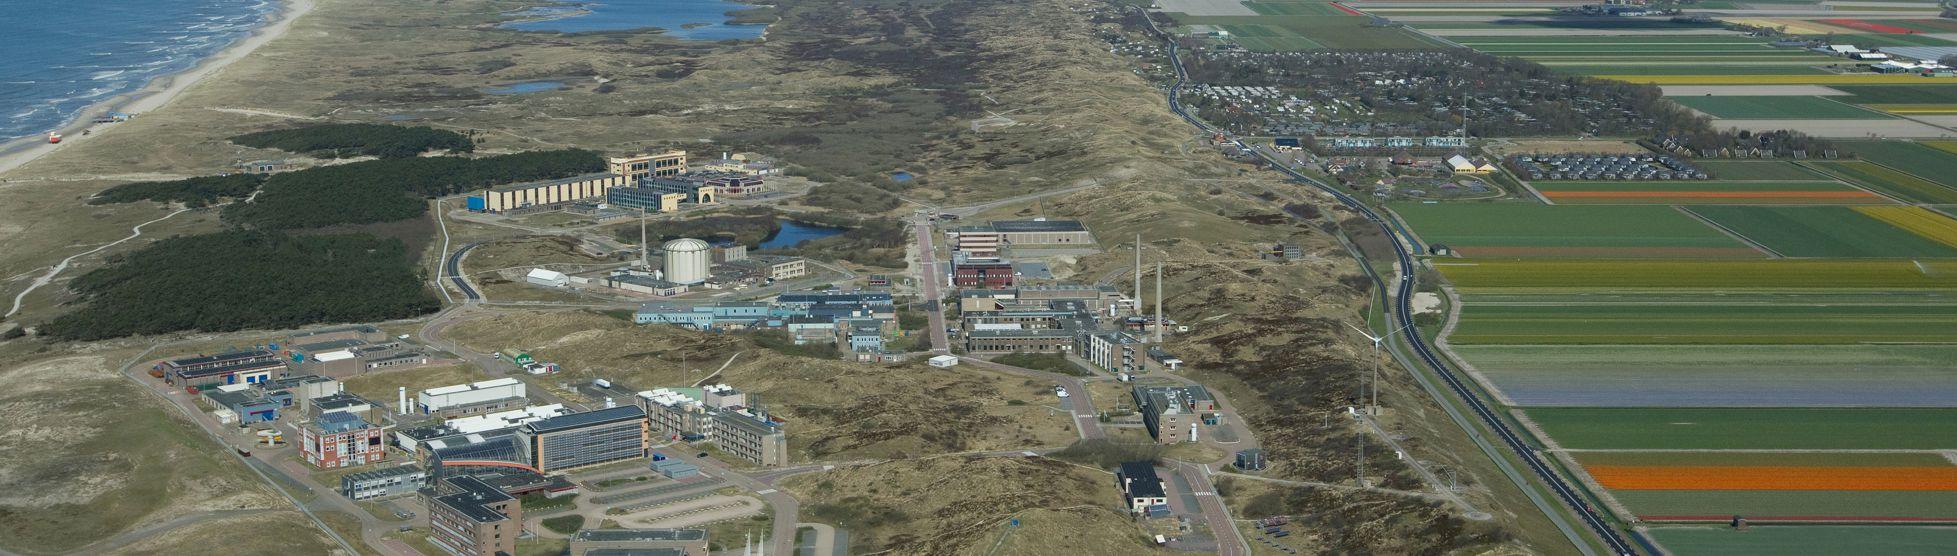 Renovatie 1e WKO-installatie Energieonderzoek Centrum Nederland